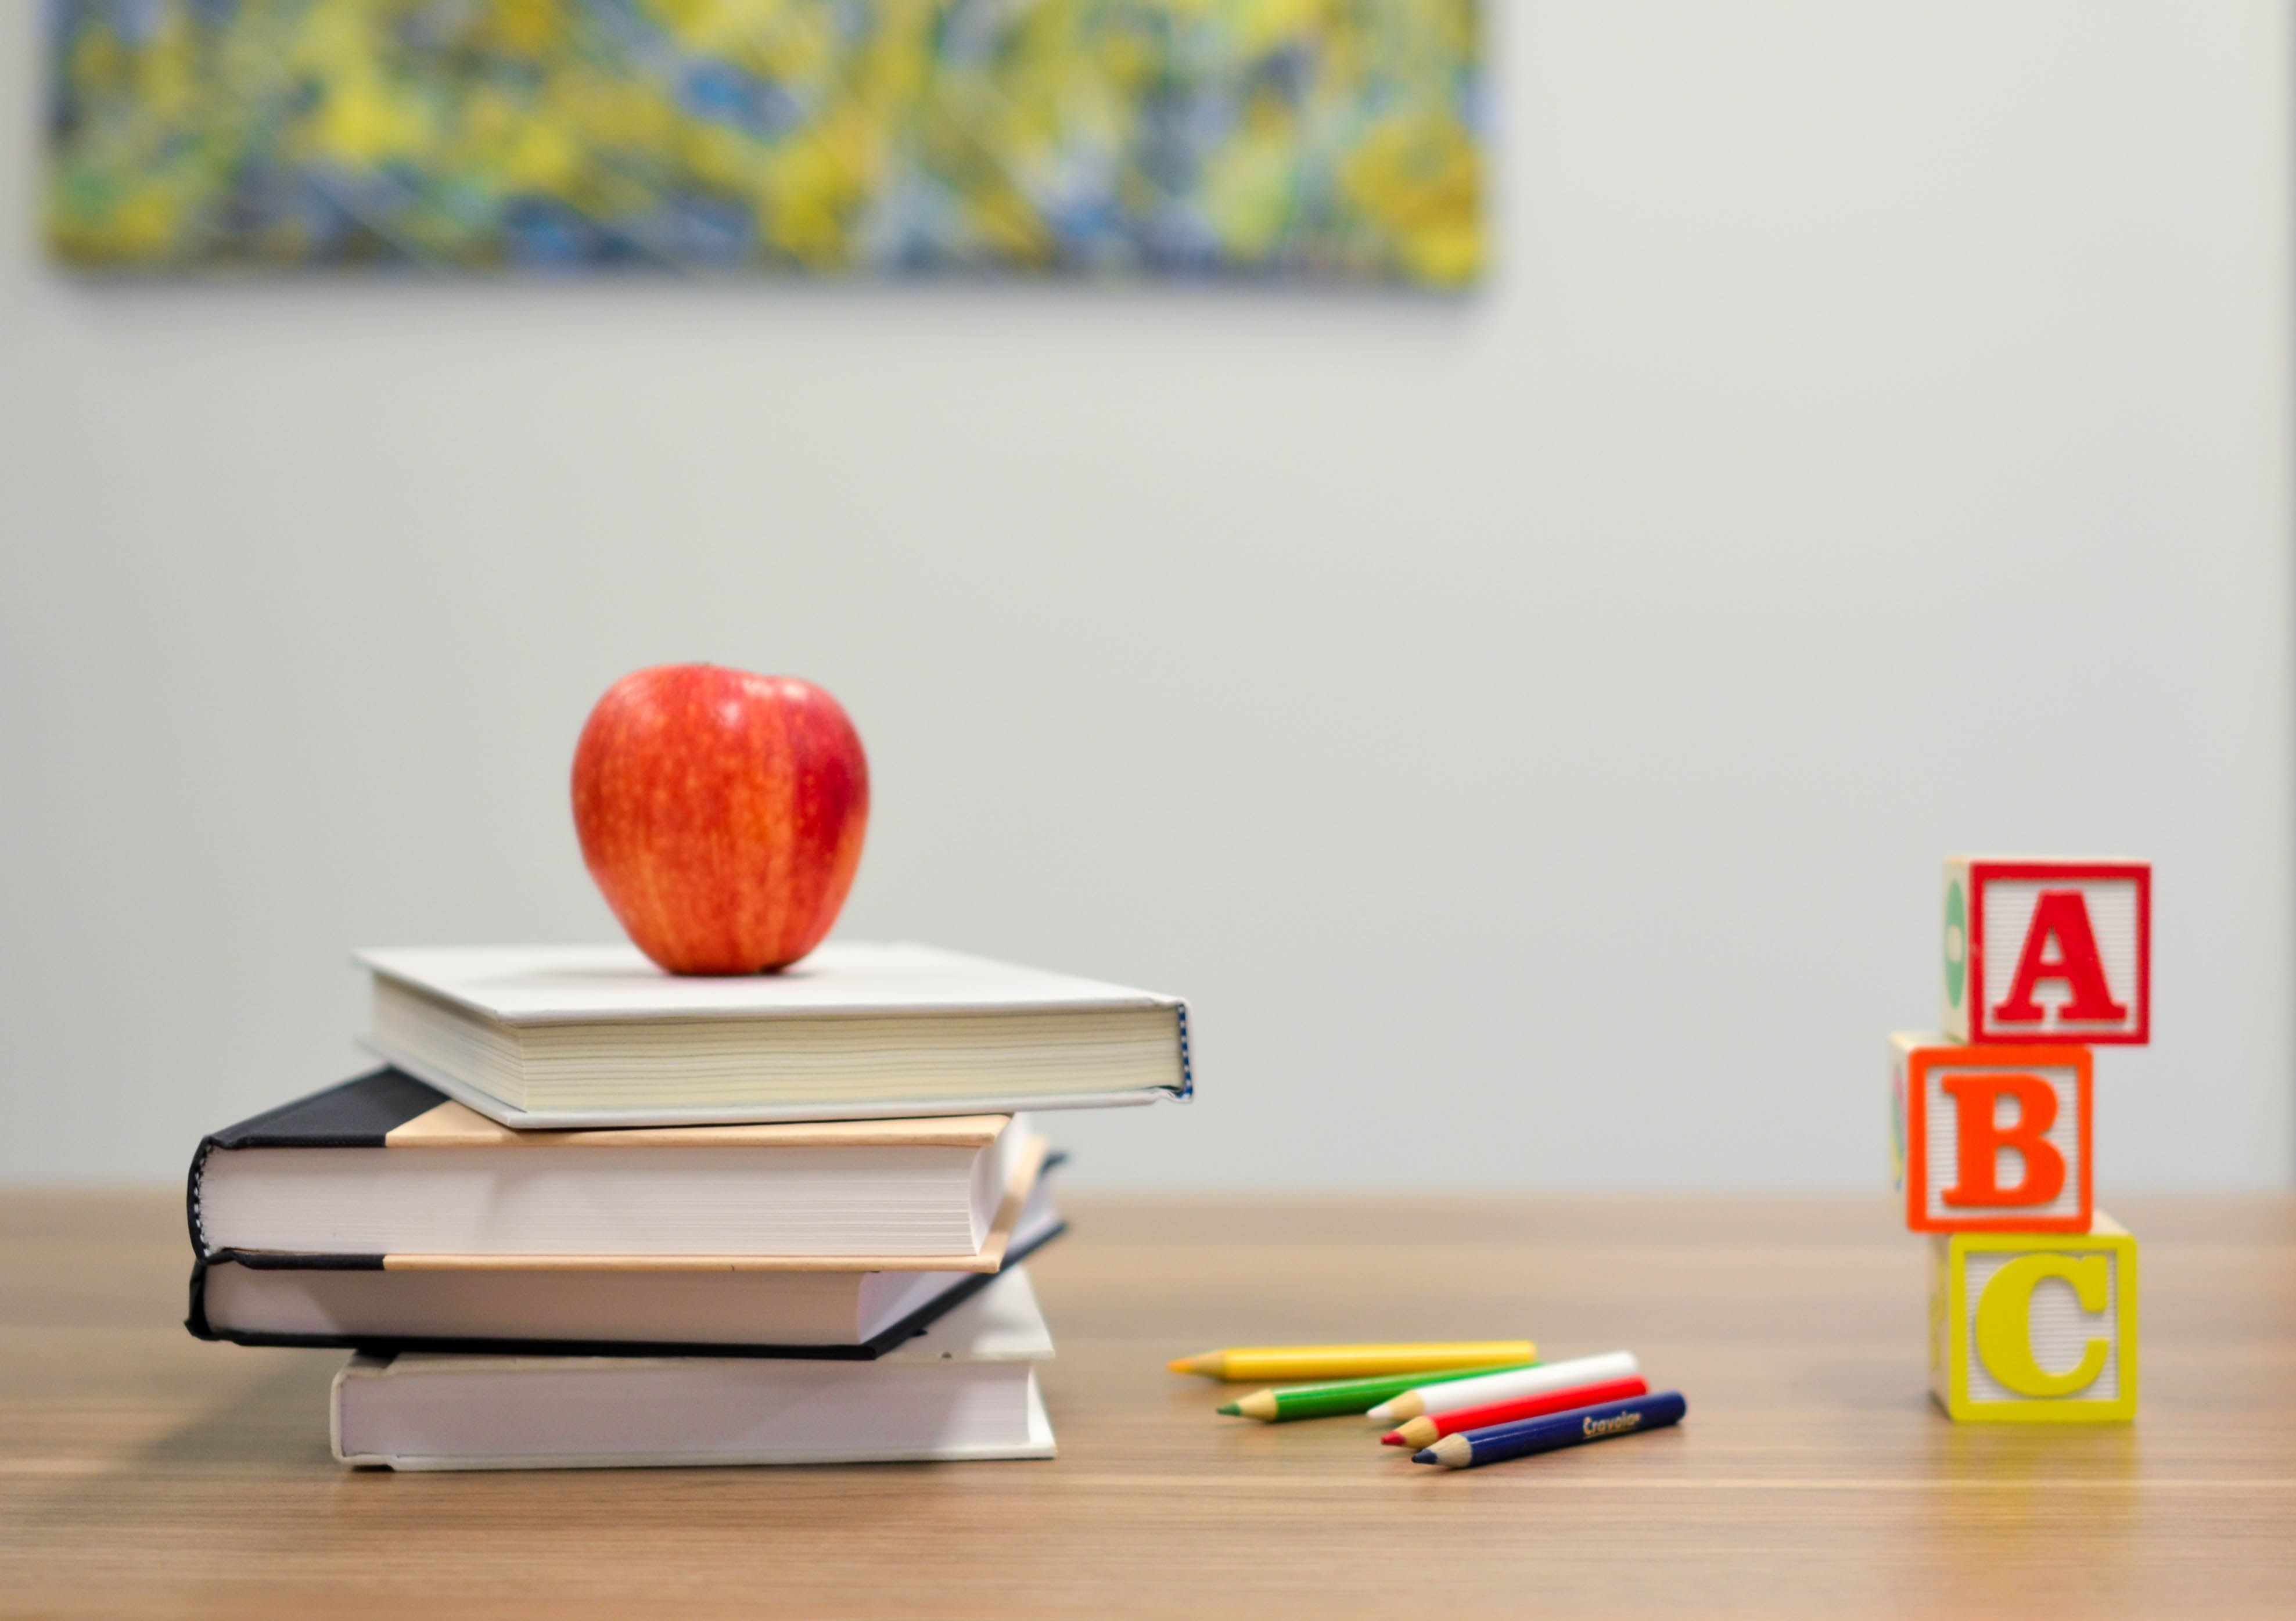 Serenity Education & Day Treatment